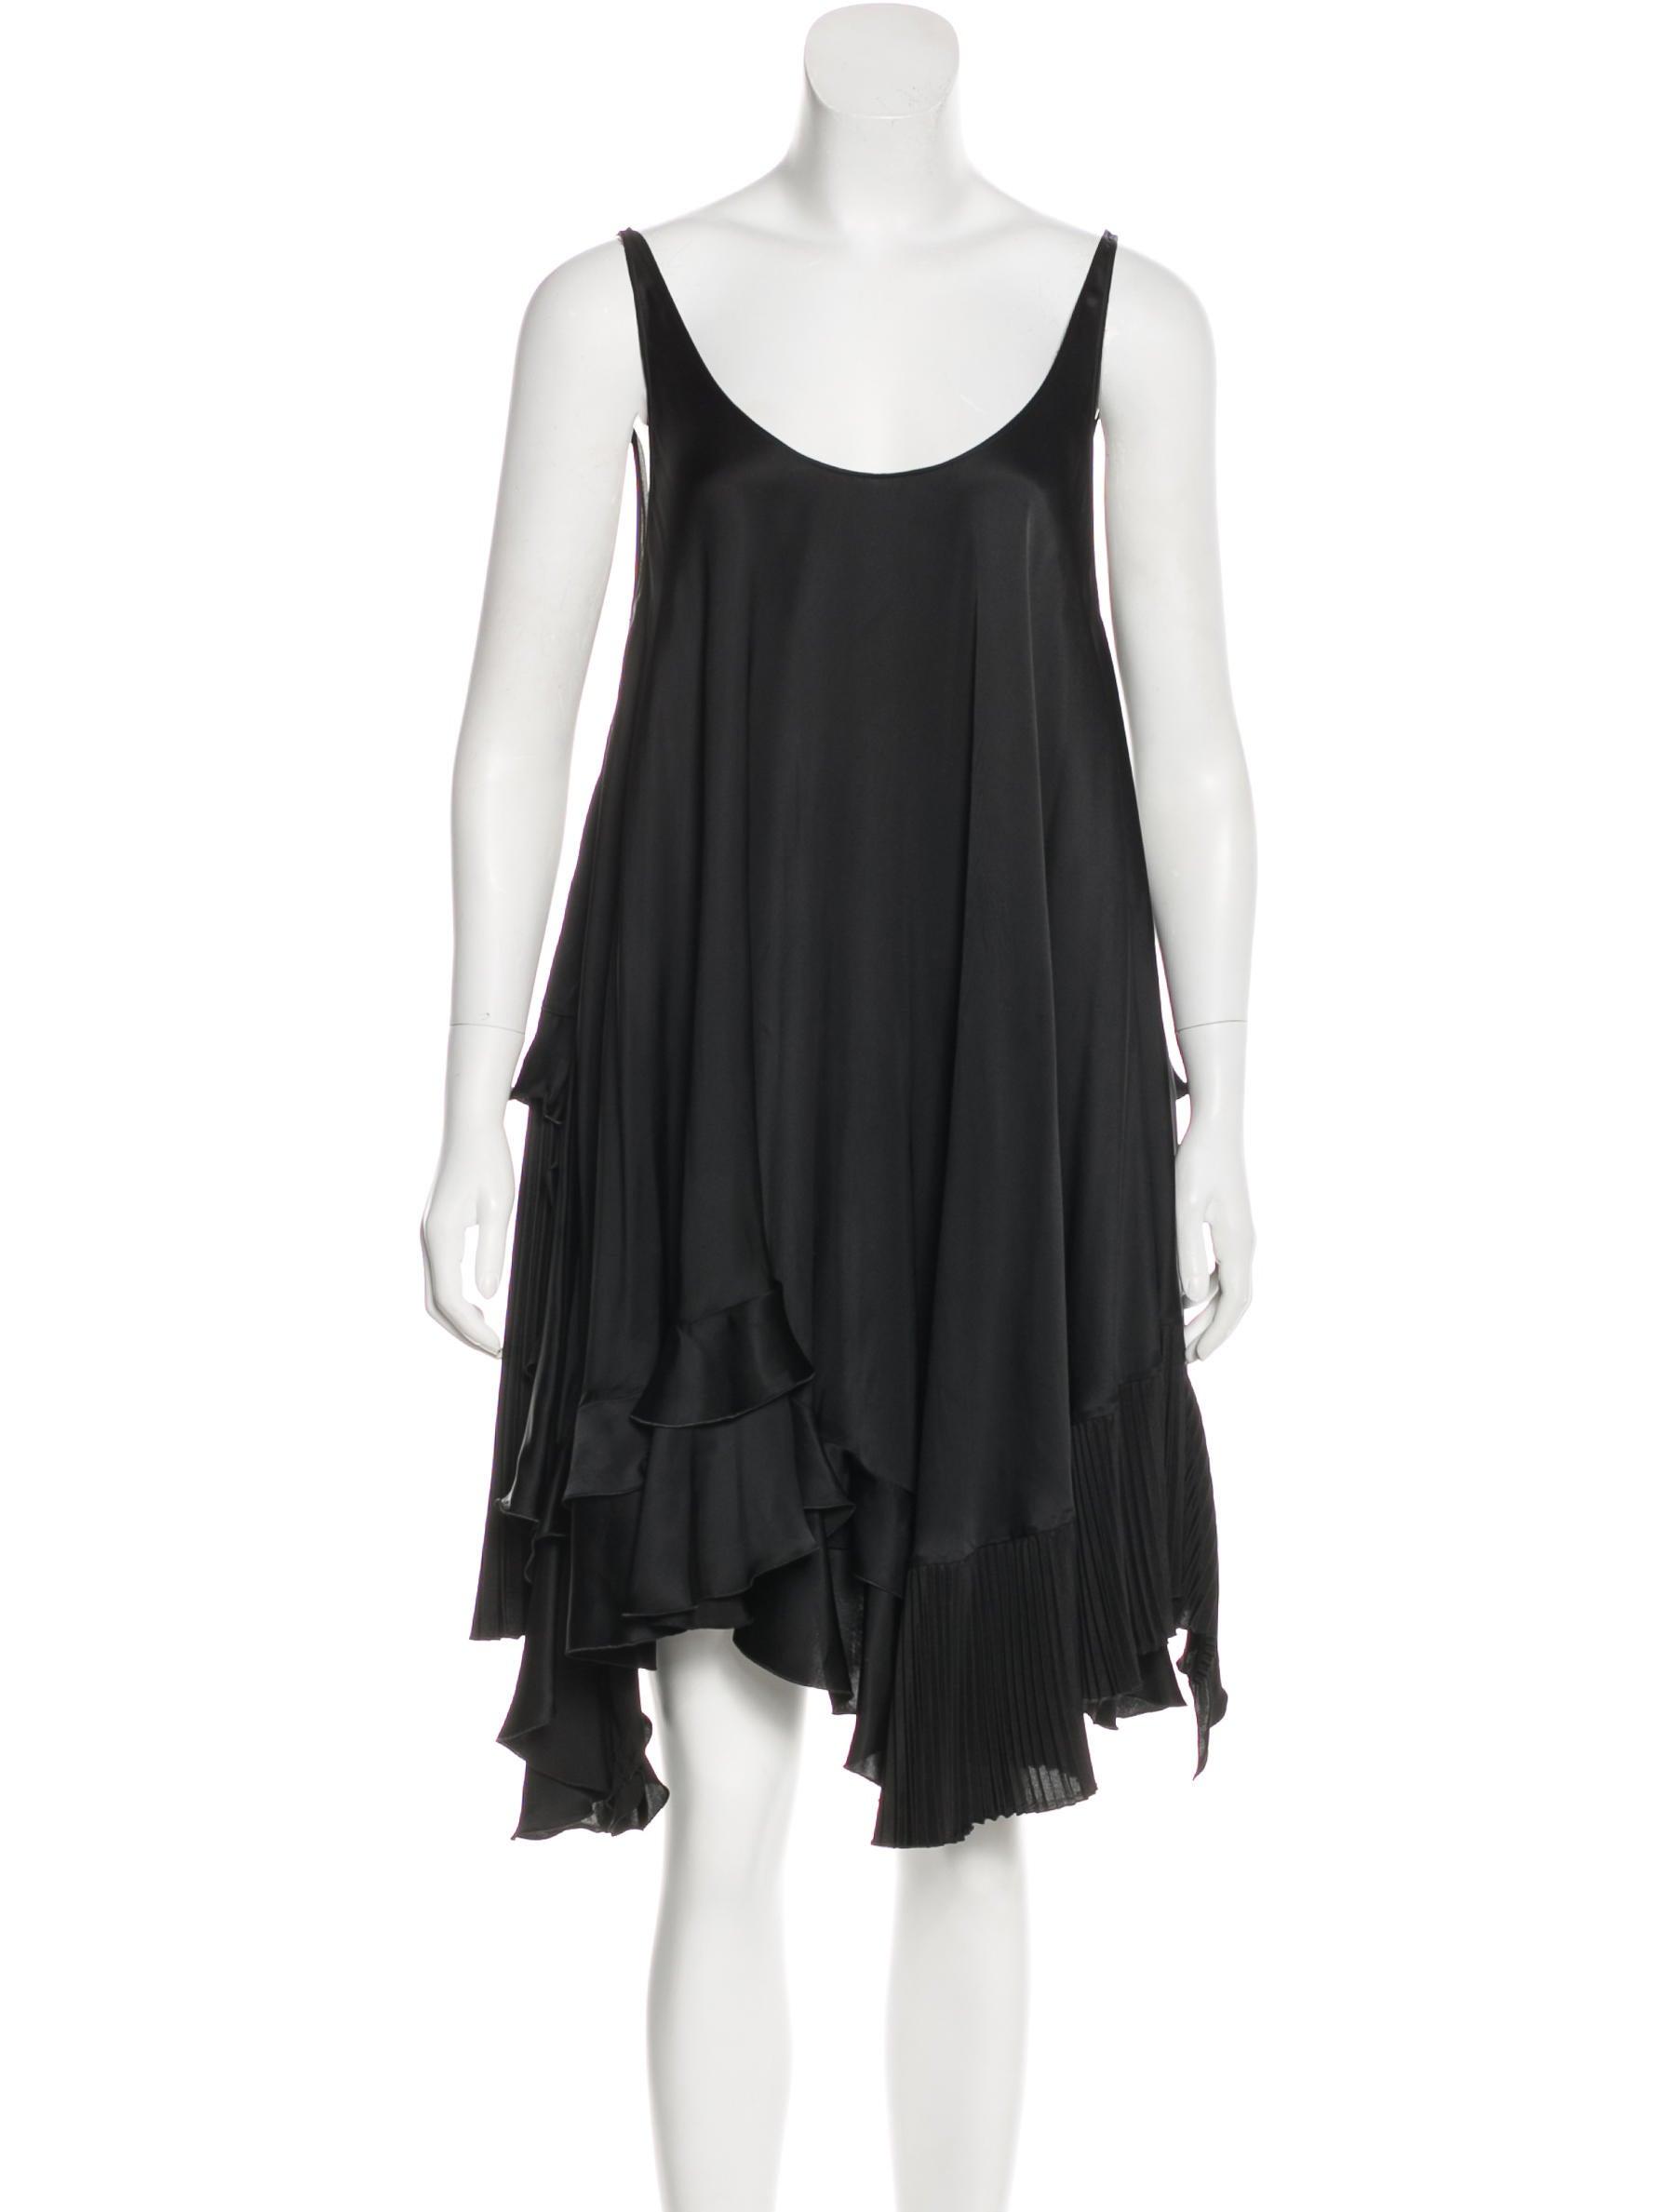 63a8dab88d5 Stella McCartney Satin Asymmetrical Dress - Clothing - STL65127 ...